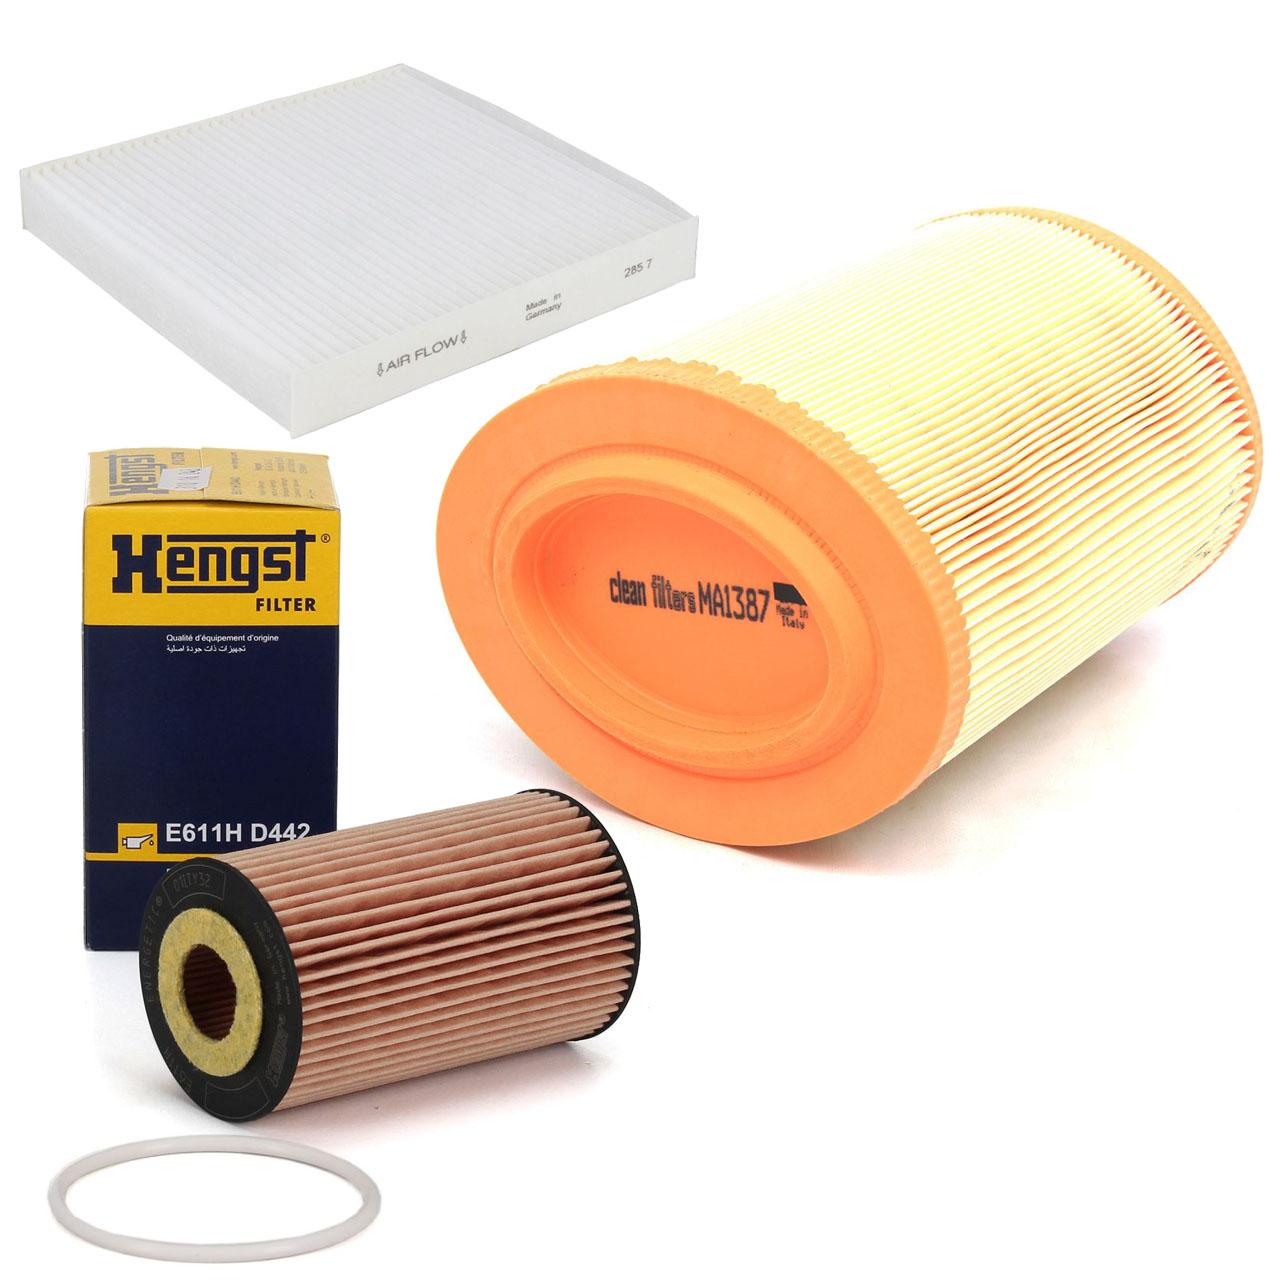 Inspektionskit Filterpaket Filterset Alfa Romeo 159 (939) 1.8 MPI 140 PS